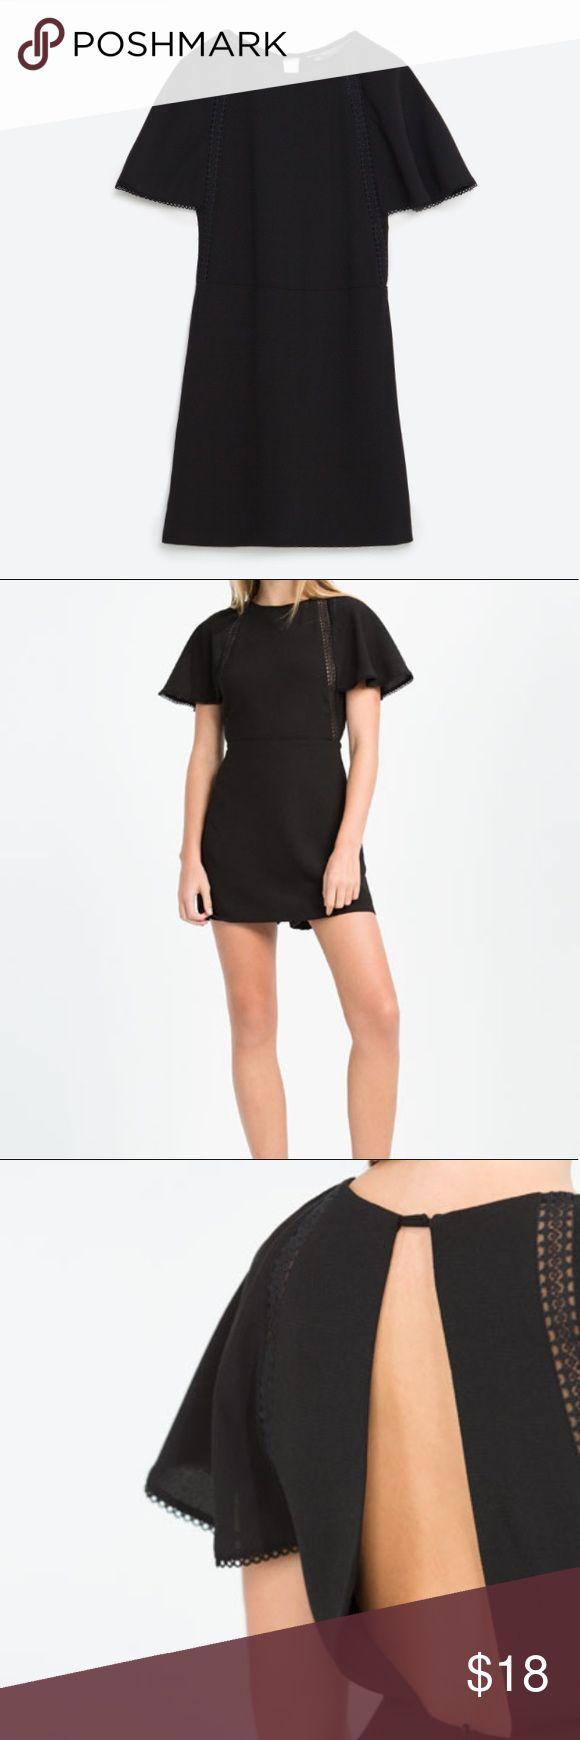 Zara Jumpsuit Dress - Trafaluc Collection Zara Jumpsuit Dress - Trafaluc Collection Zara Dresses